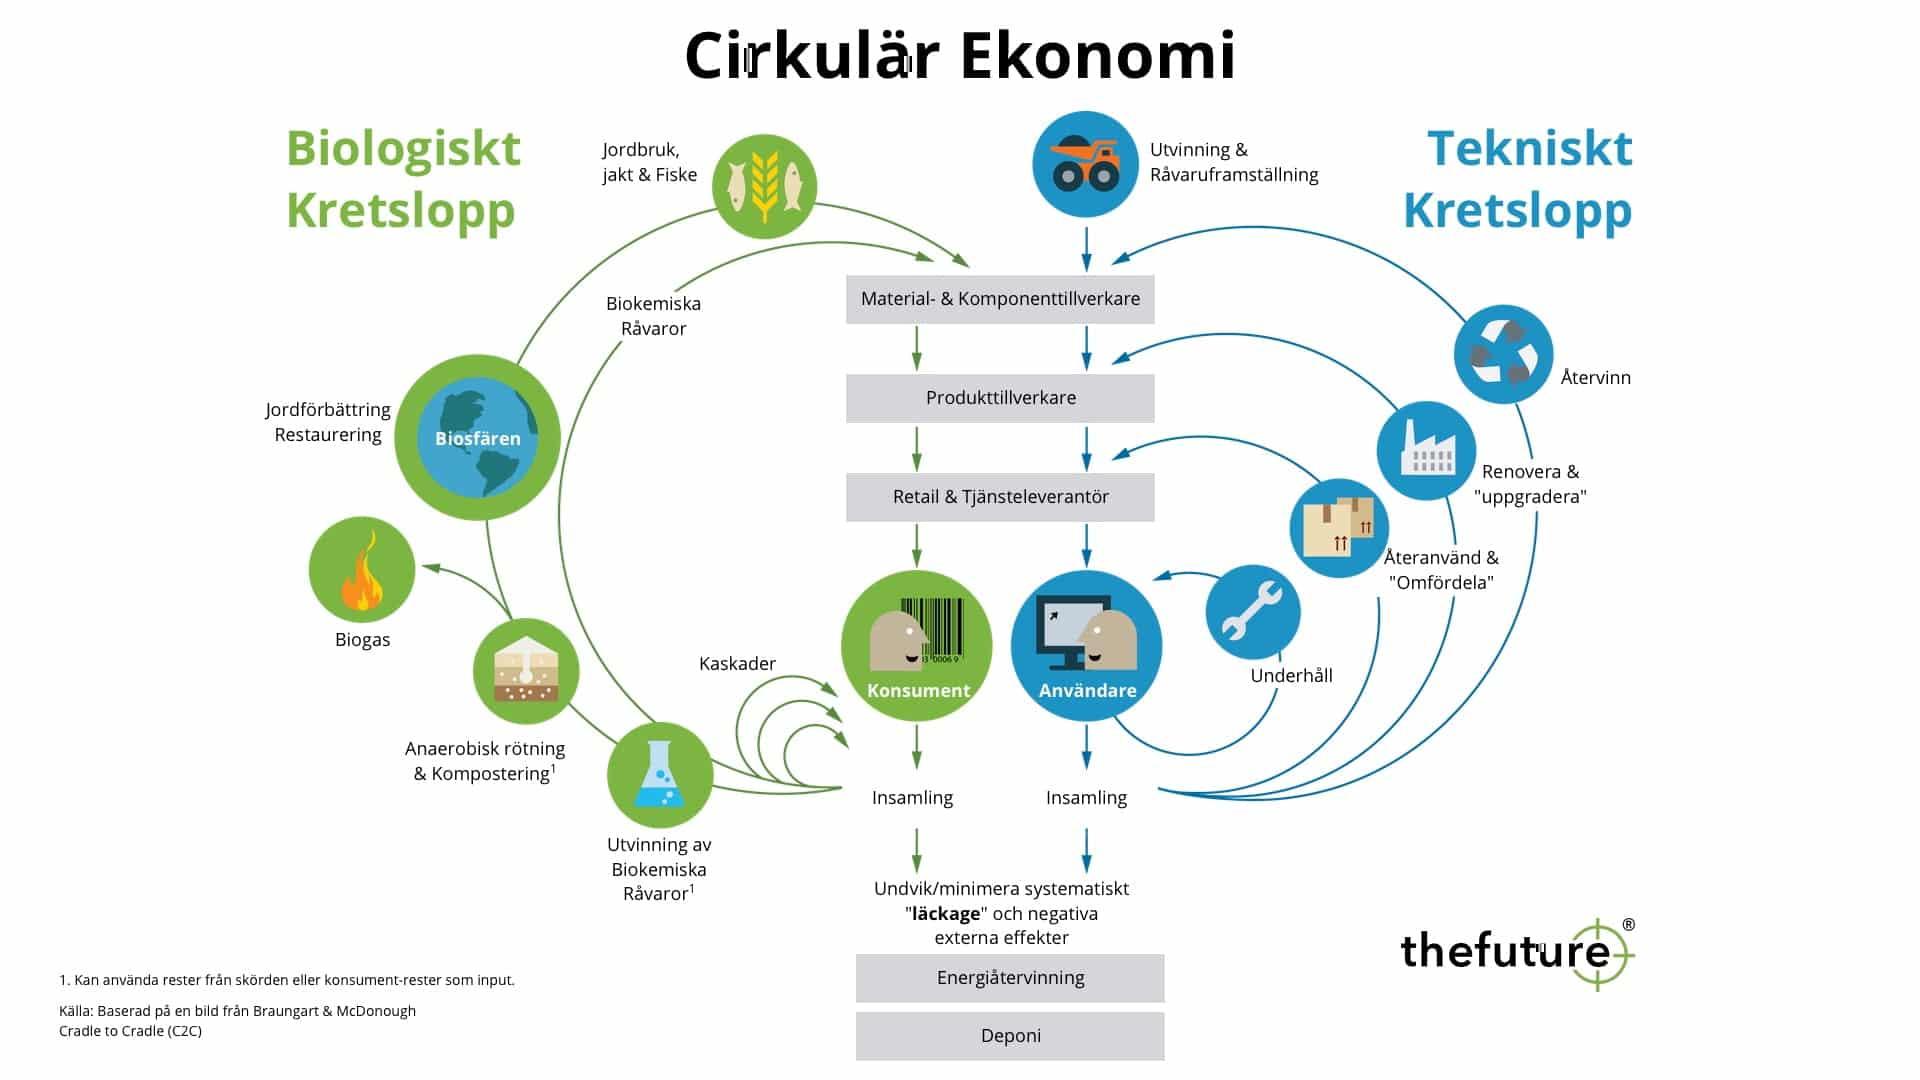 thefuture, resurser, cirkulär ekonomi, circular economy